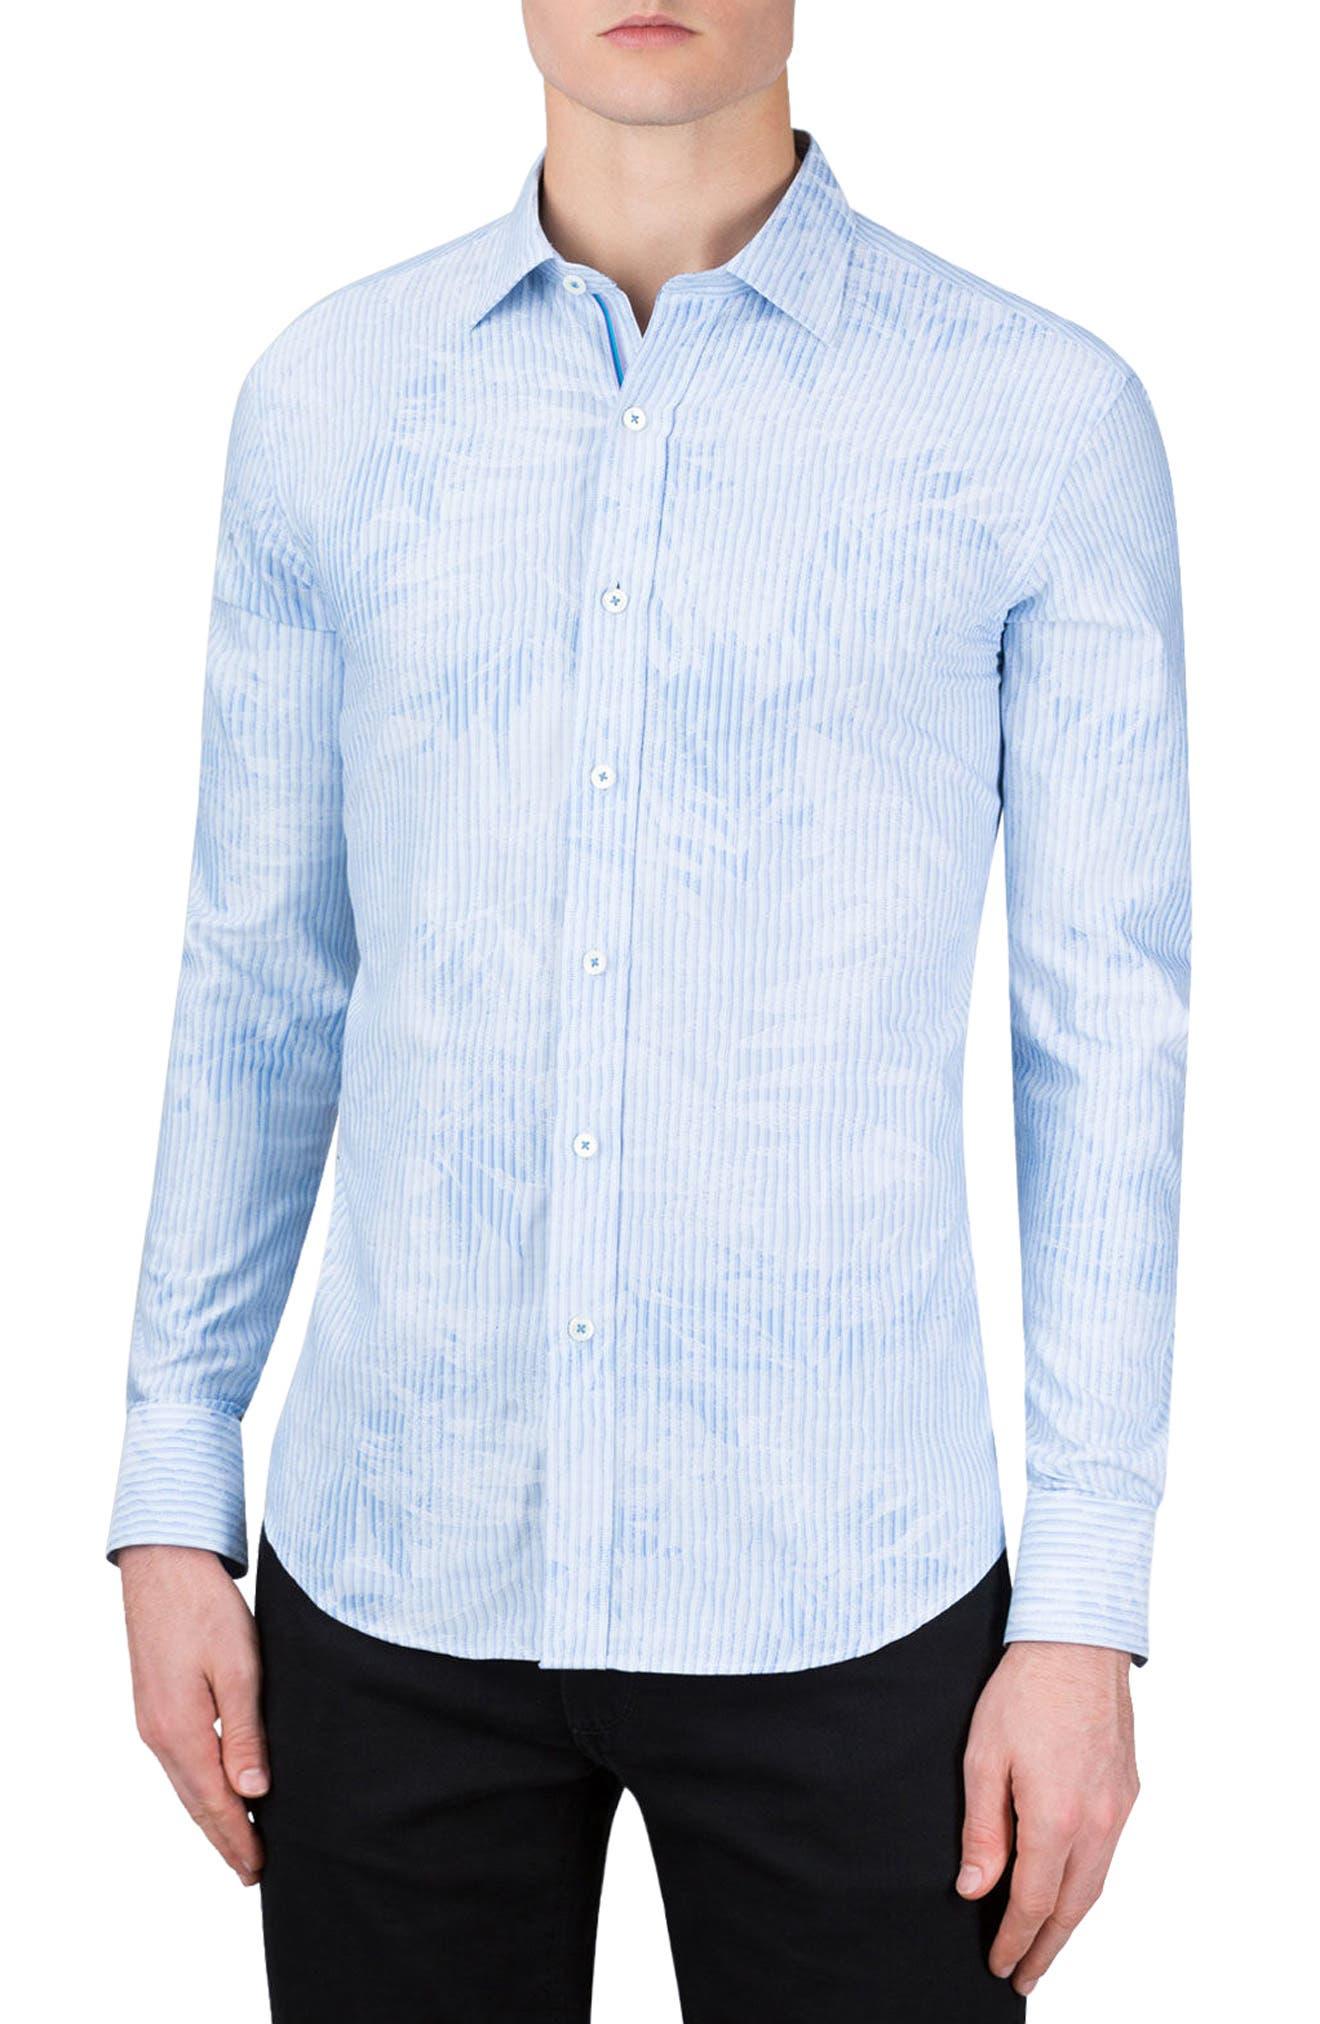 Alternate Image 1 Selected - Bugatchi Shaped Fit Floral Stripe Sport Shirt